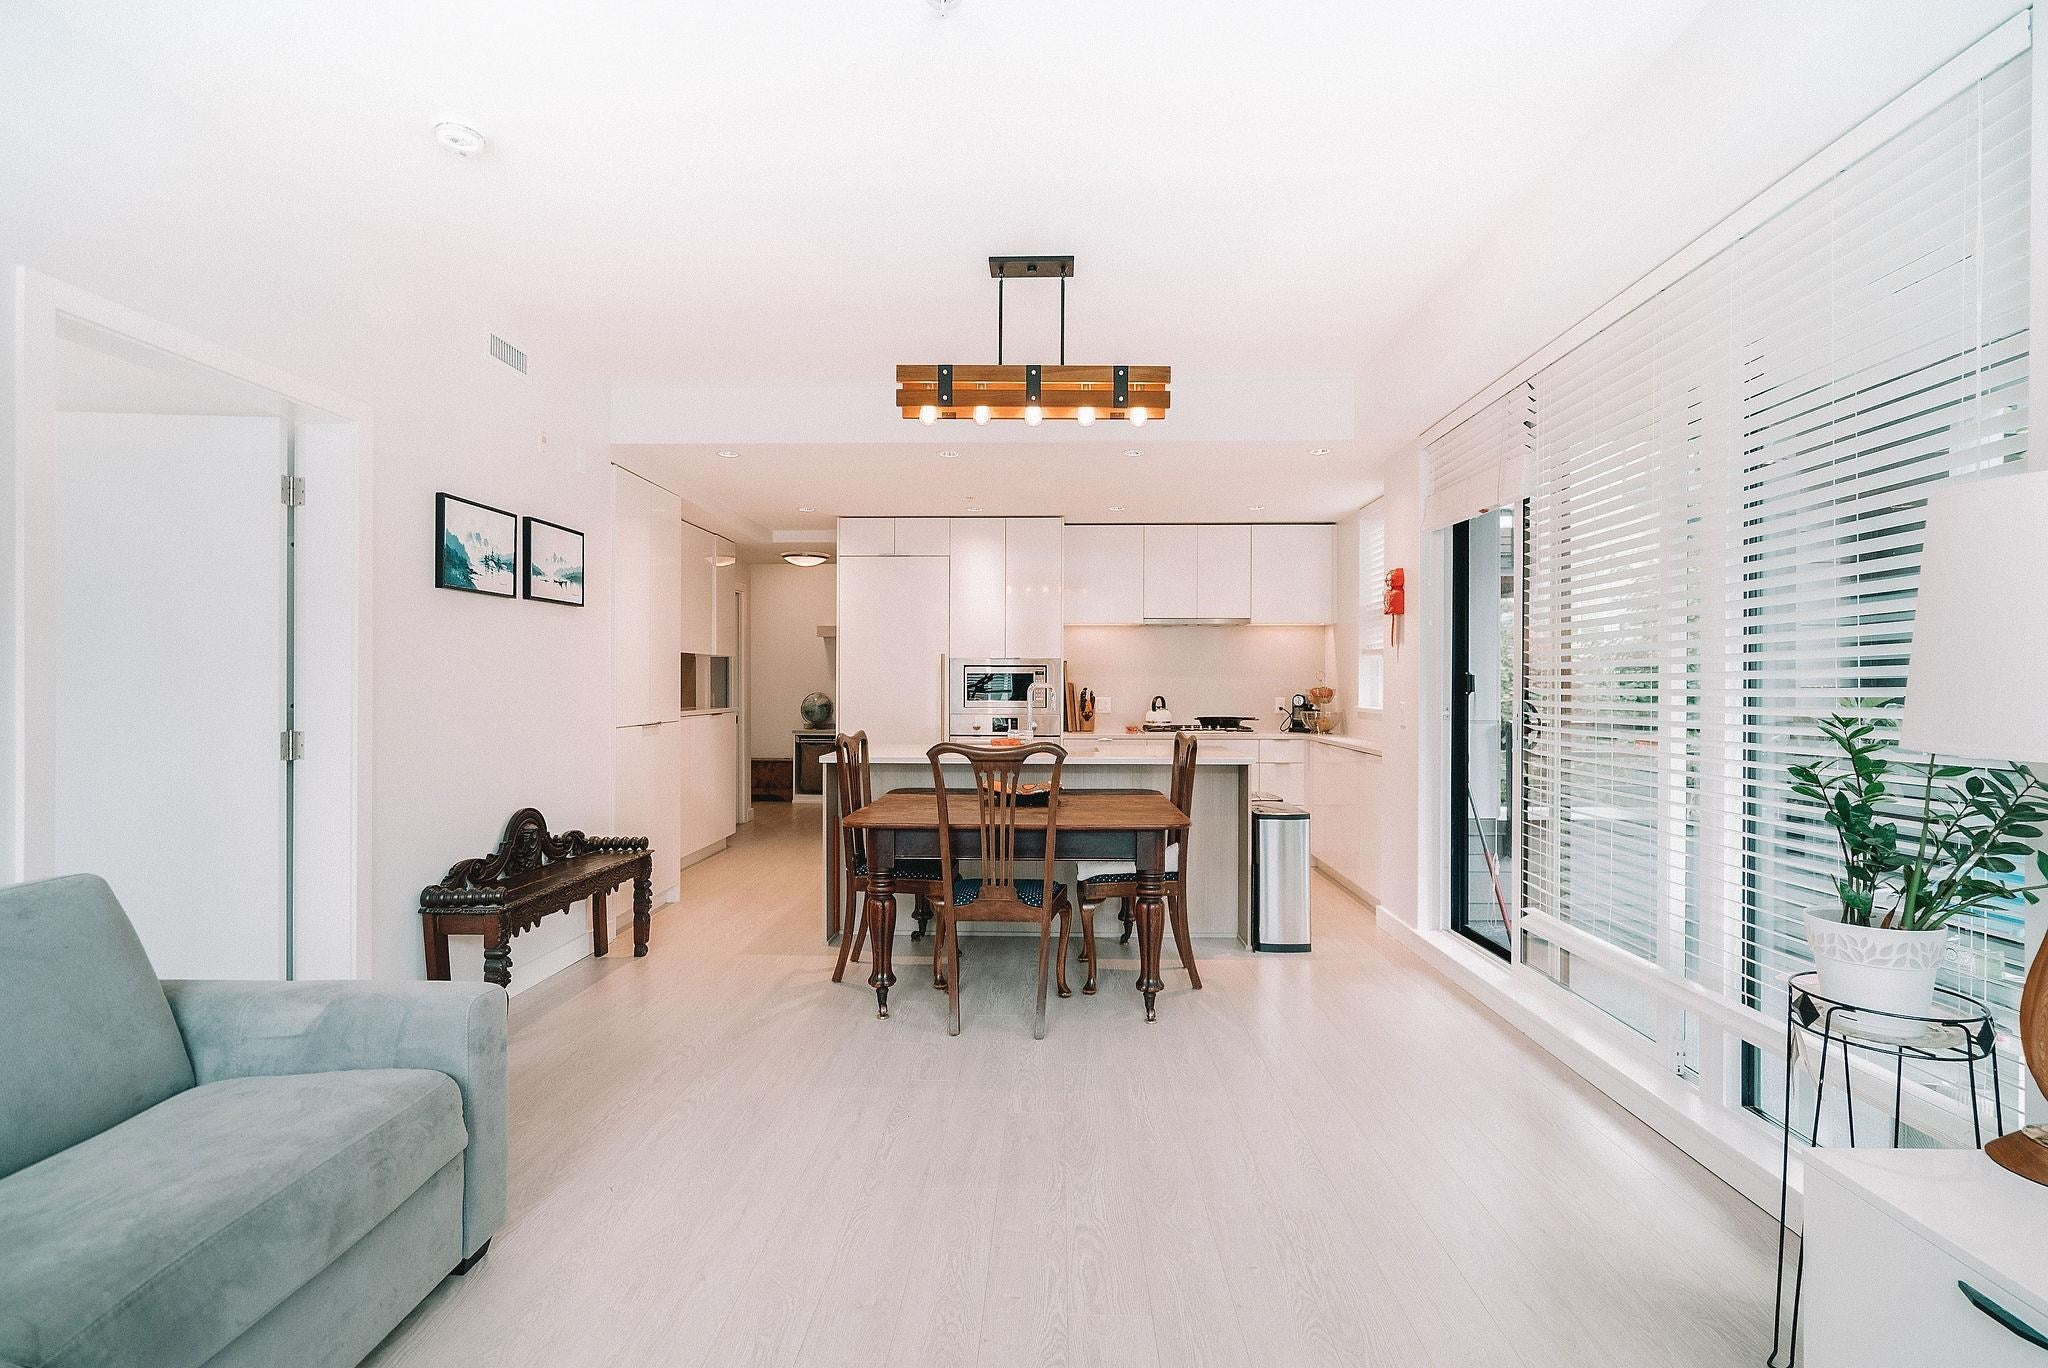 211 7988 YUKON STREET - Marpole Apartment/Condo for sale, 2 Bedrooms (R2623881)